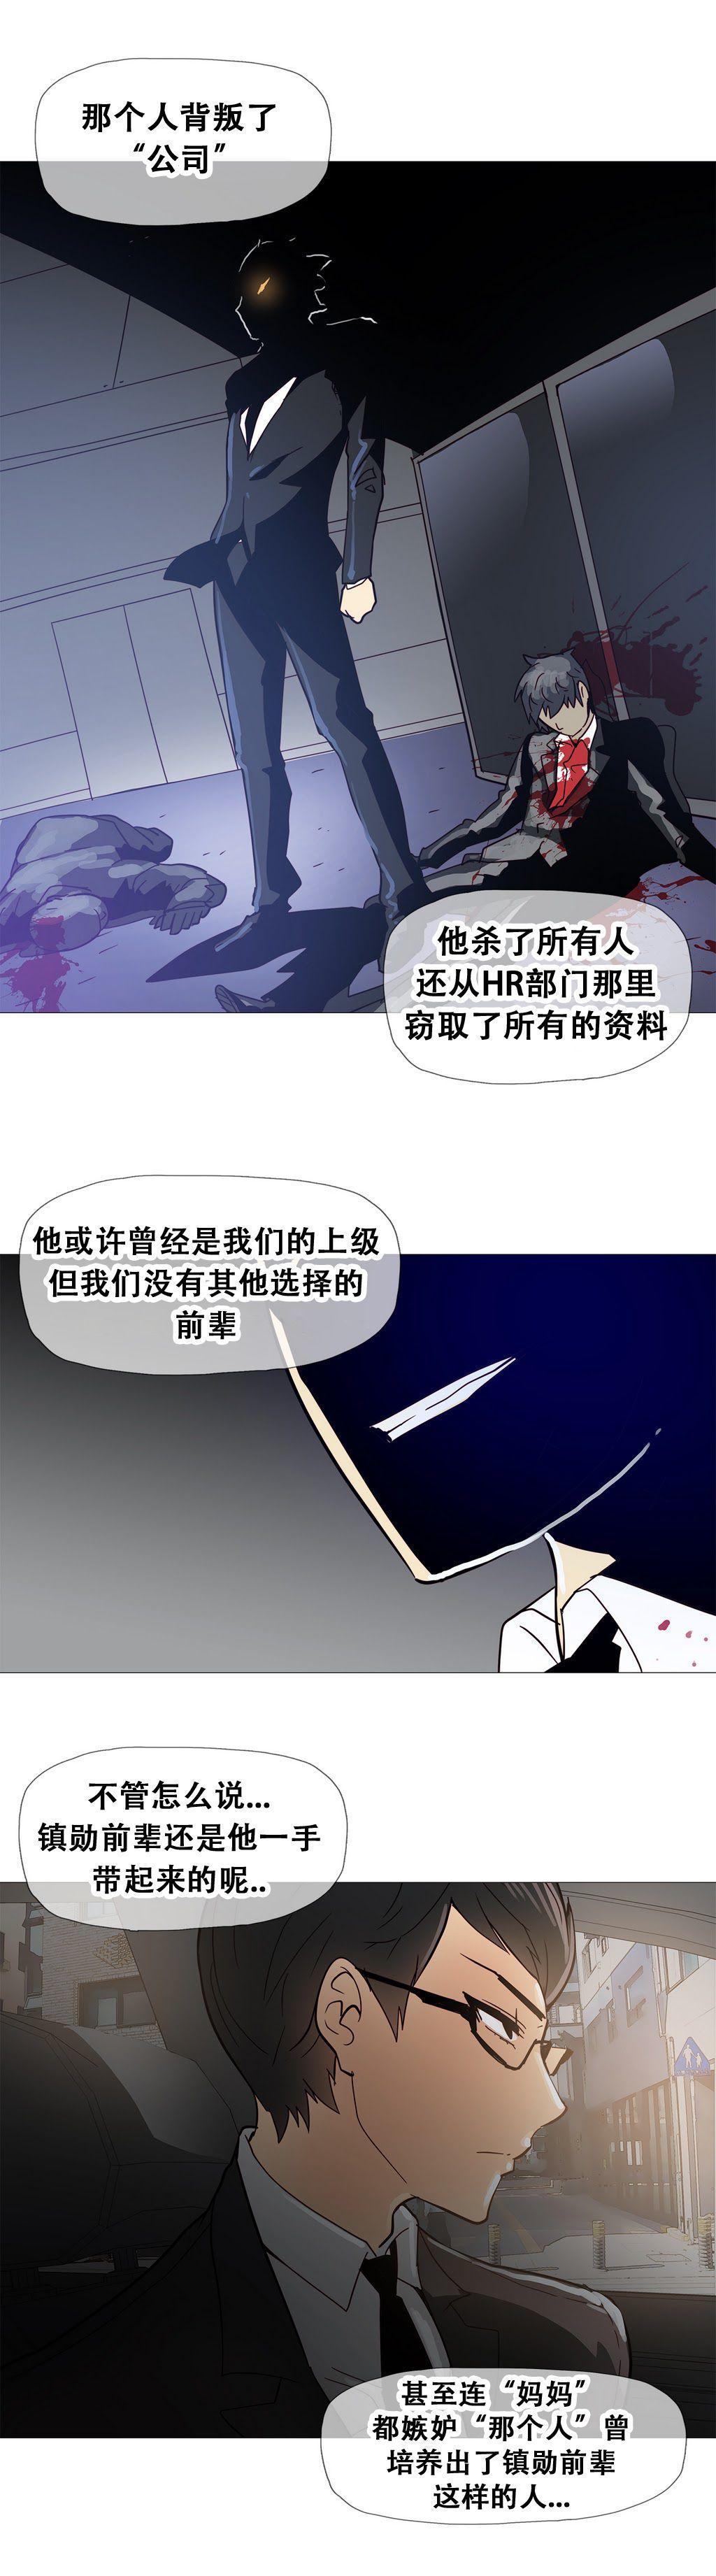 HouseHold Affairs 【卞赤鲤个人汉化】1~33话(持续更新中) 299